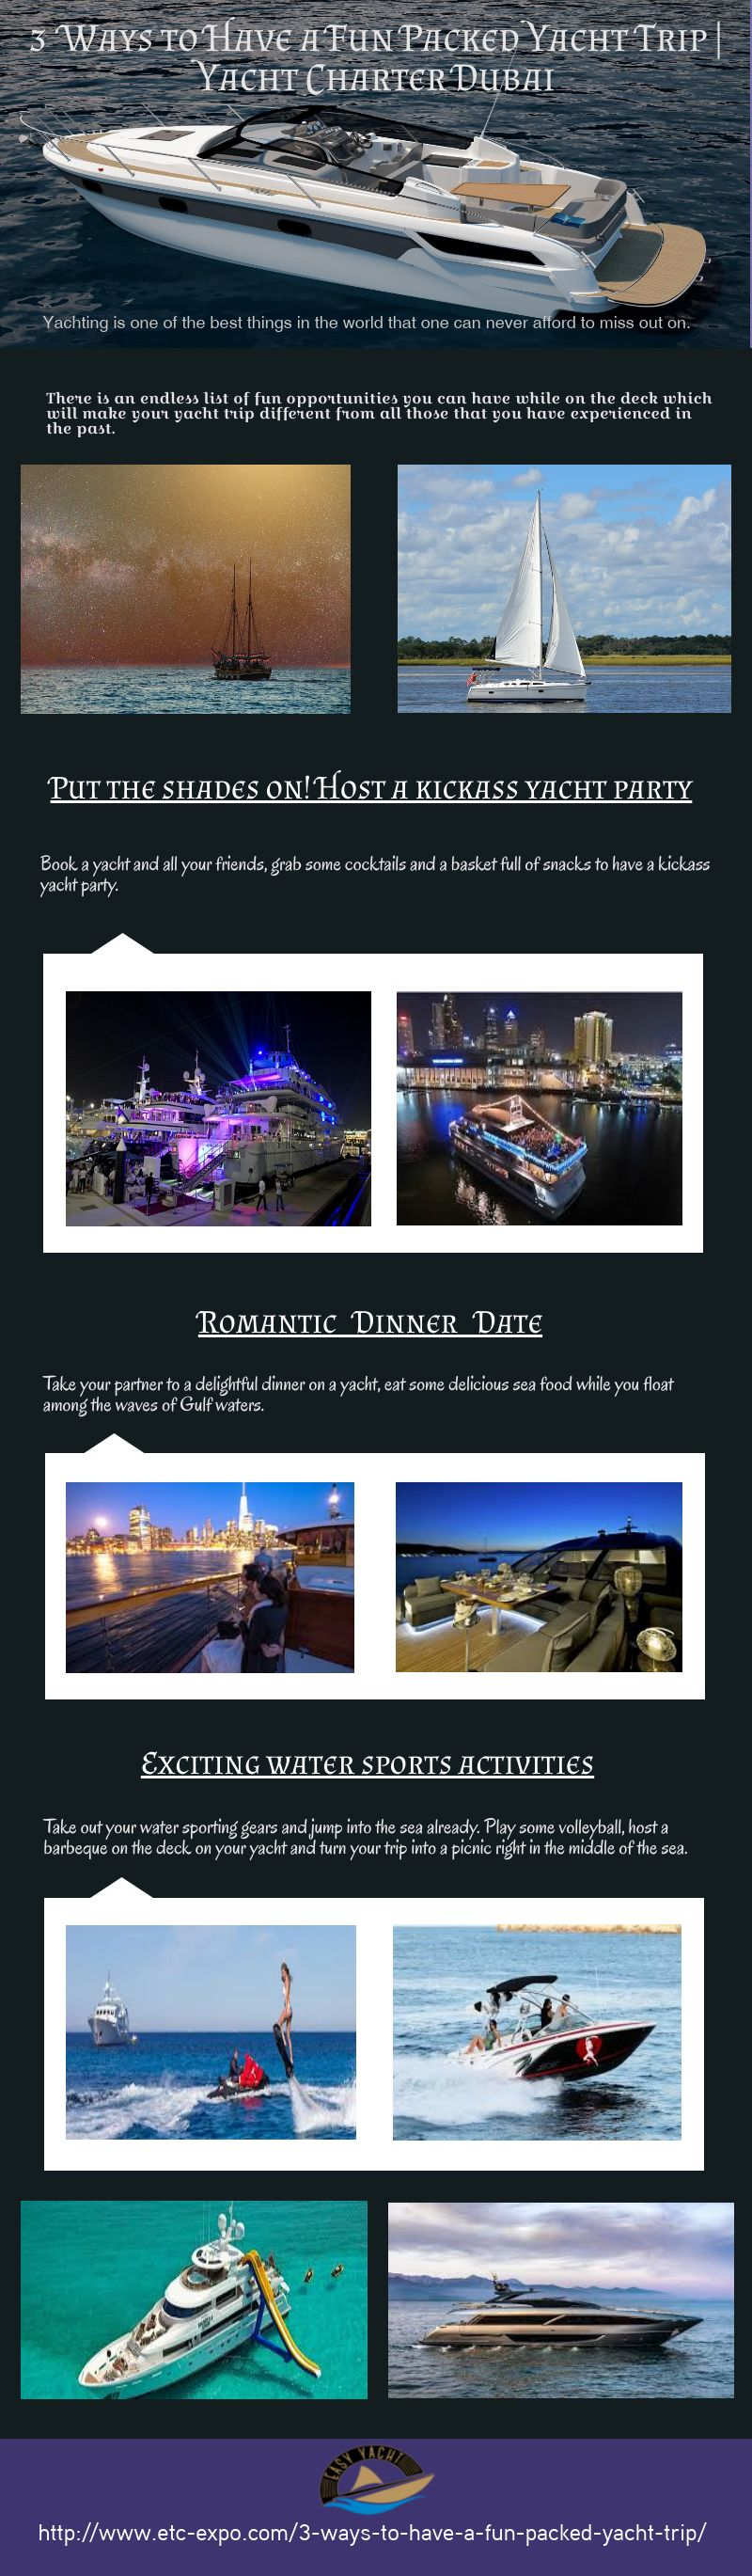 3 Ways to Have a Fun Packed Yacht Trip by saifalrehman